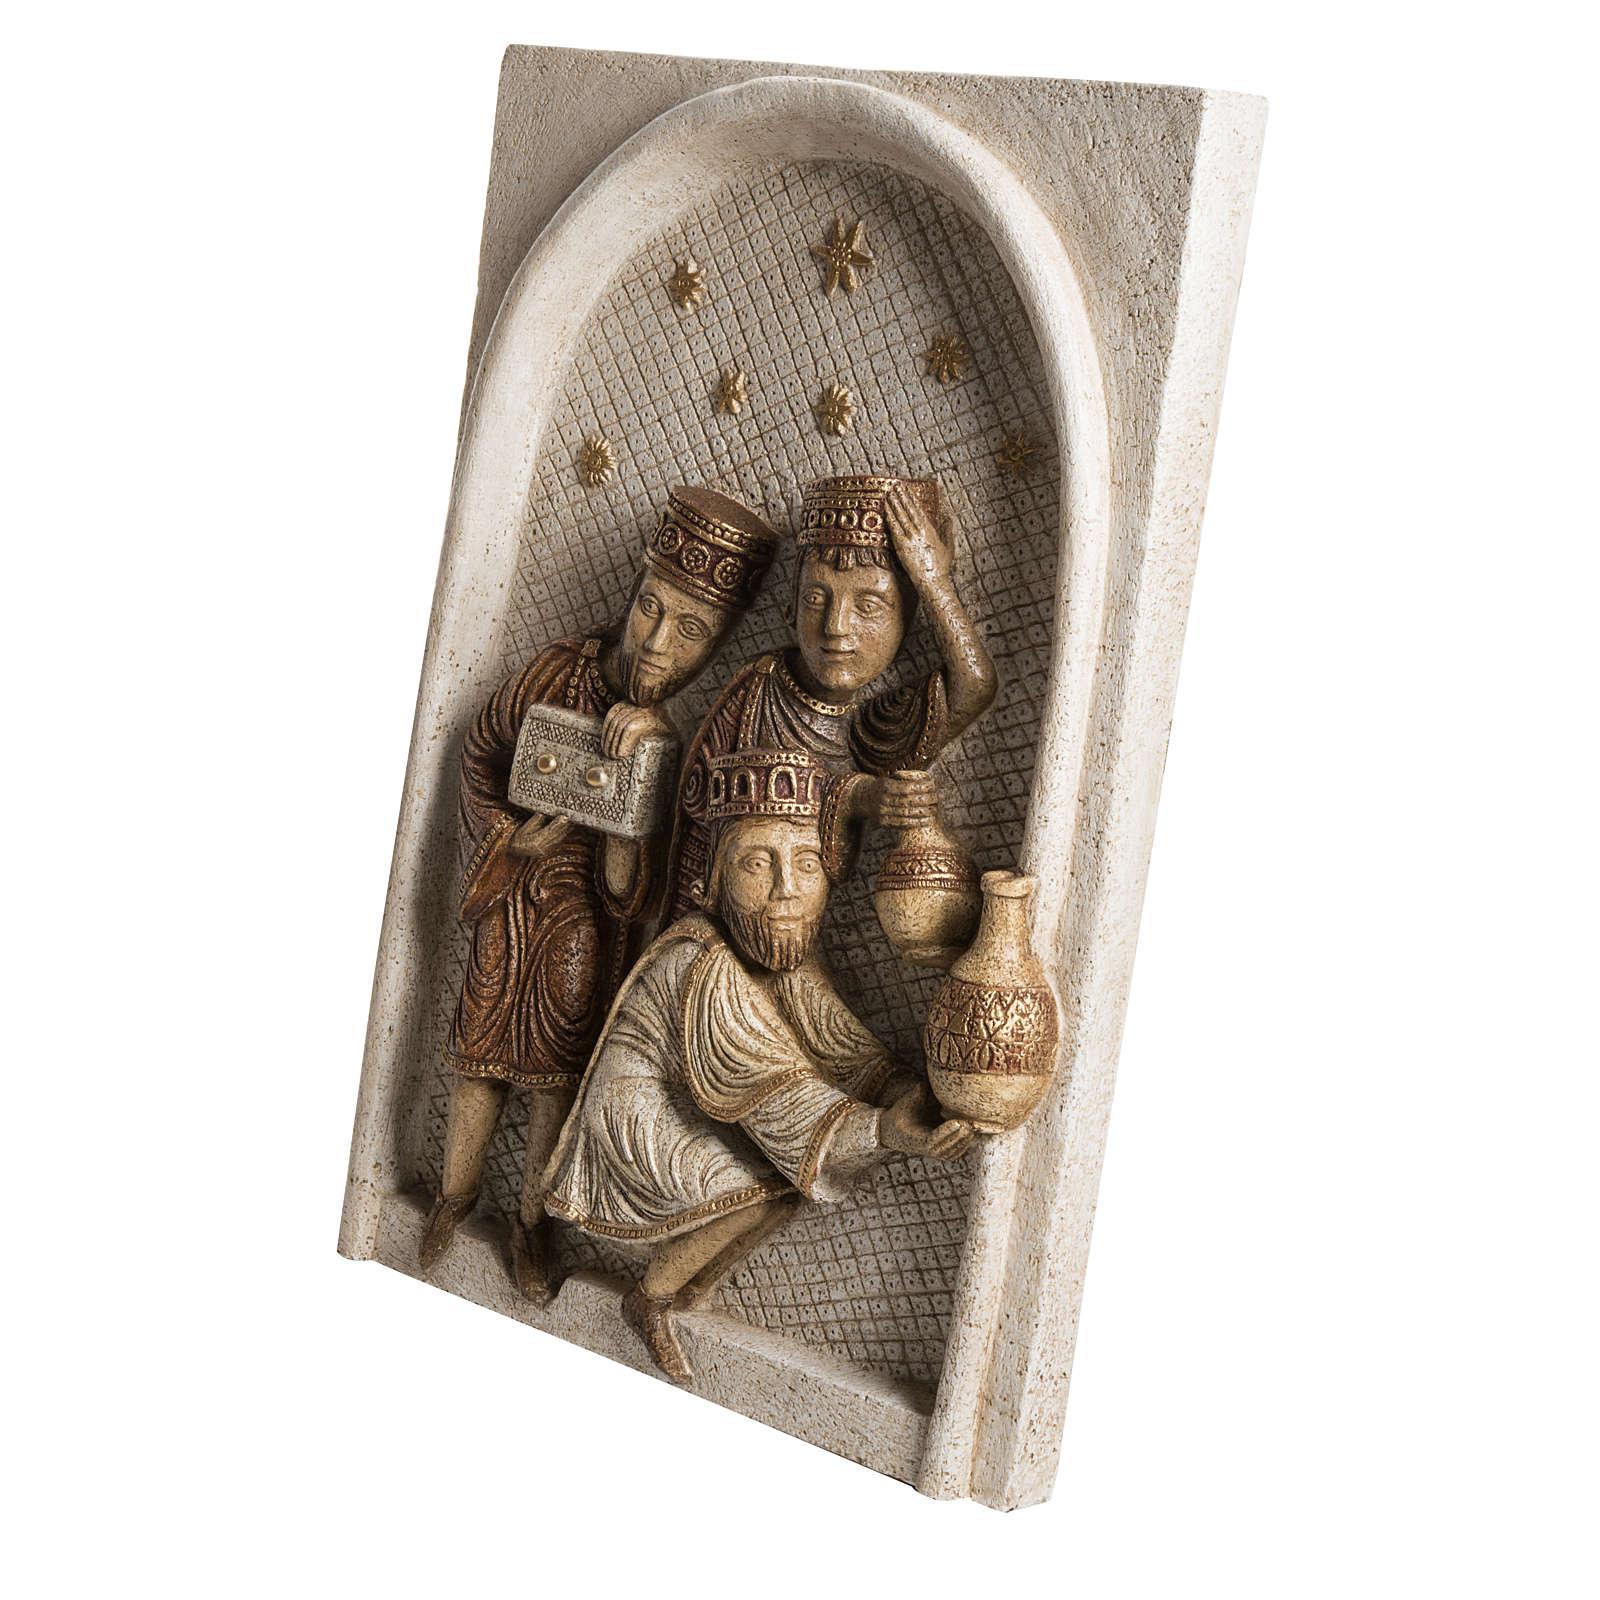 Big Autumn Nativity Scene Wise Men bas relief in stone, Bethleem 4